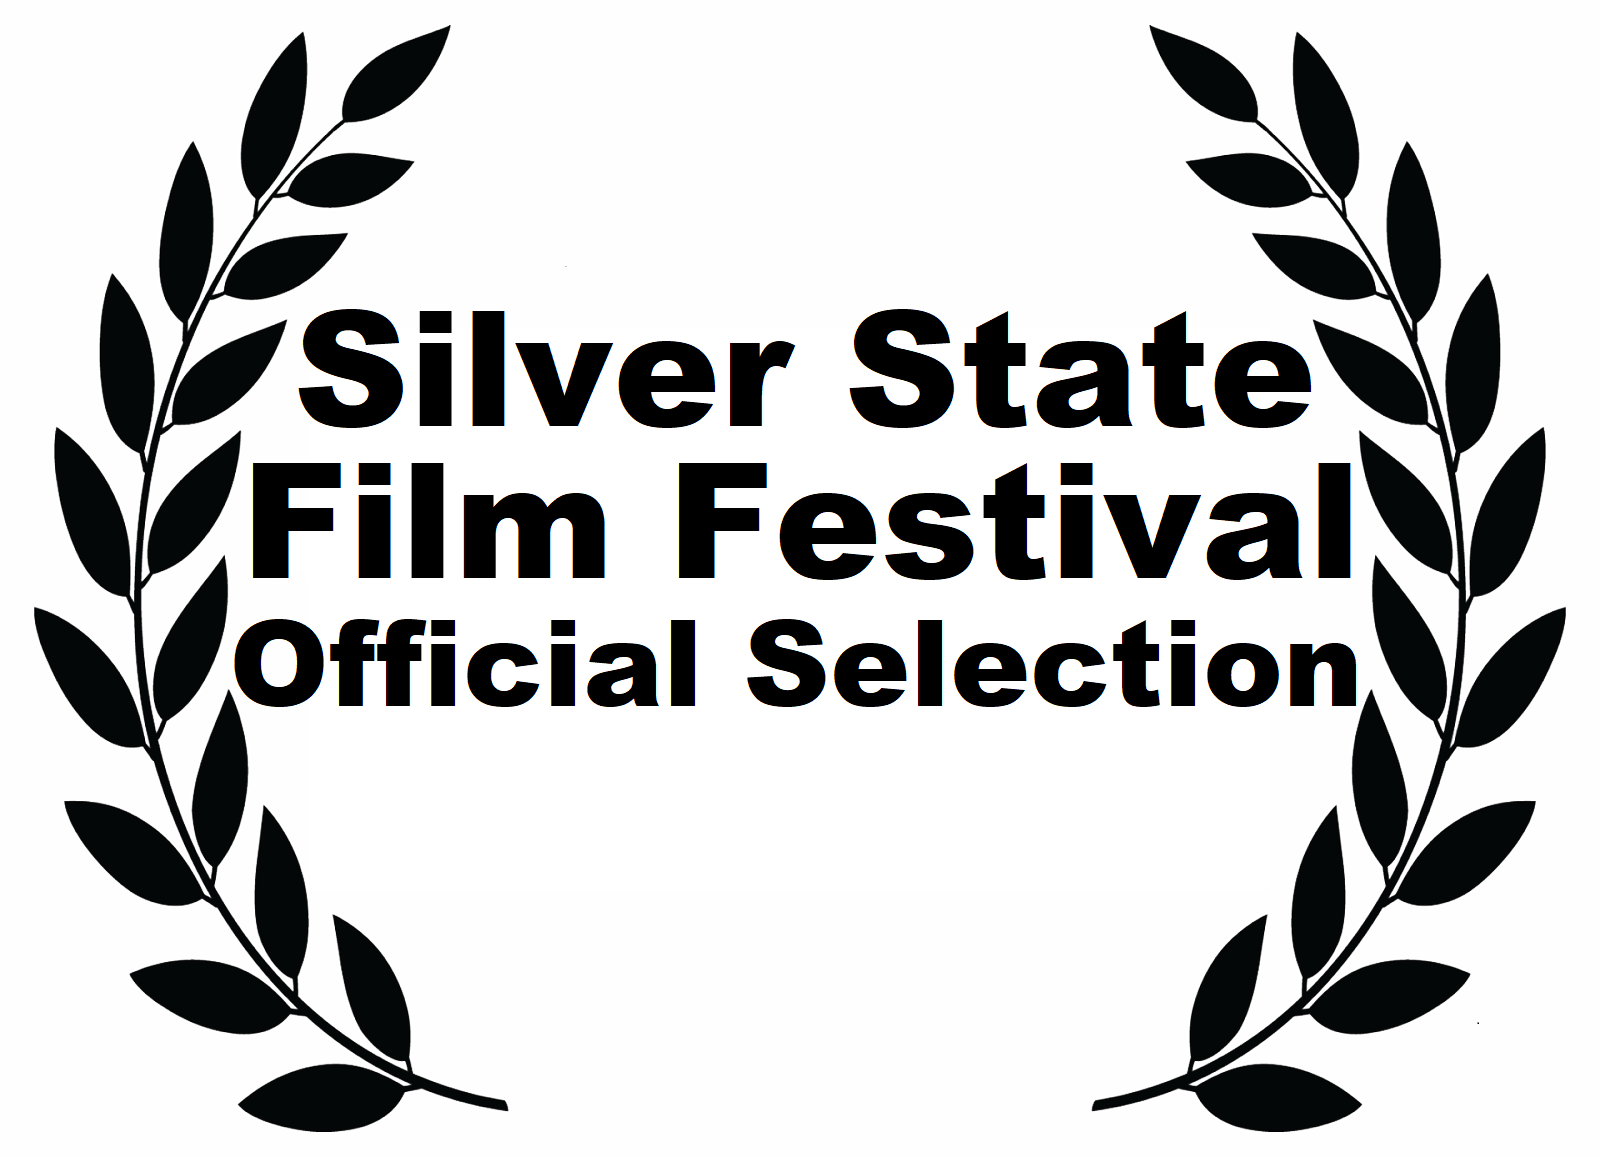 Silver State Film Festival Laurel copy.png